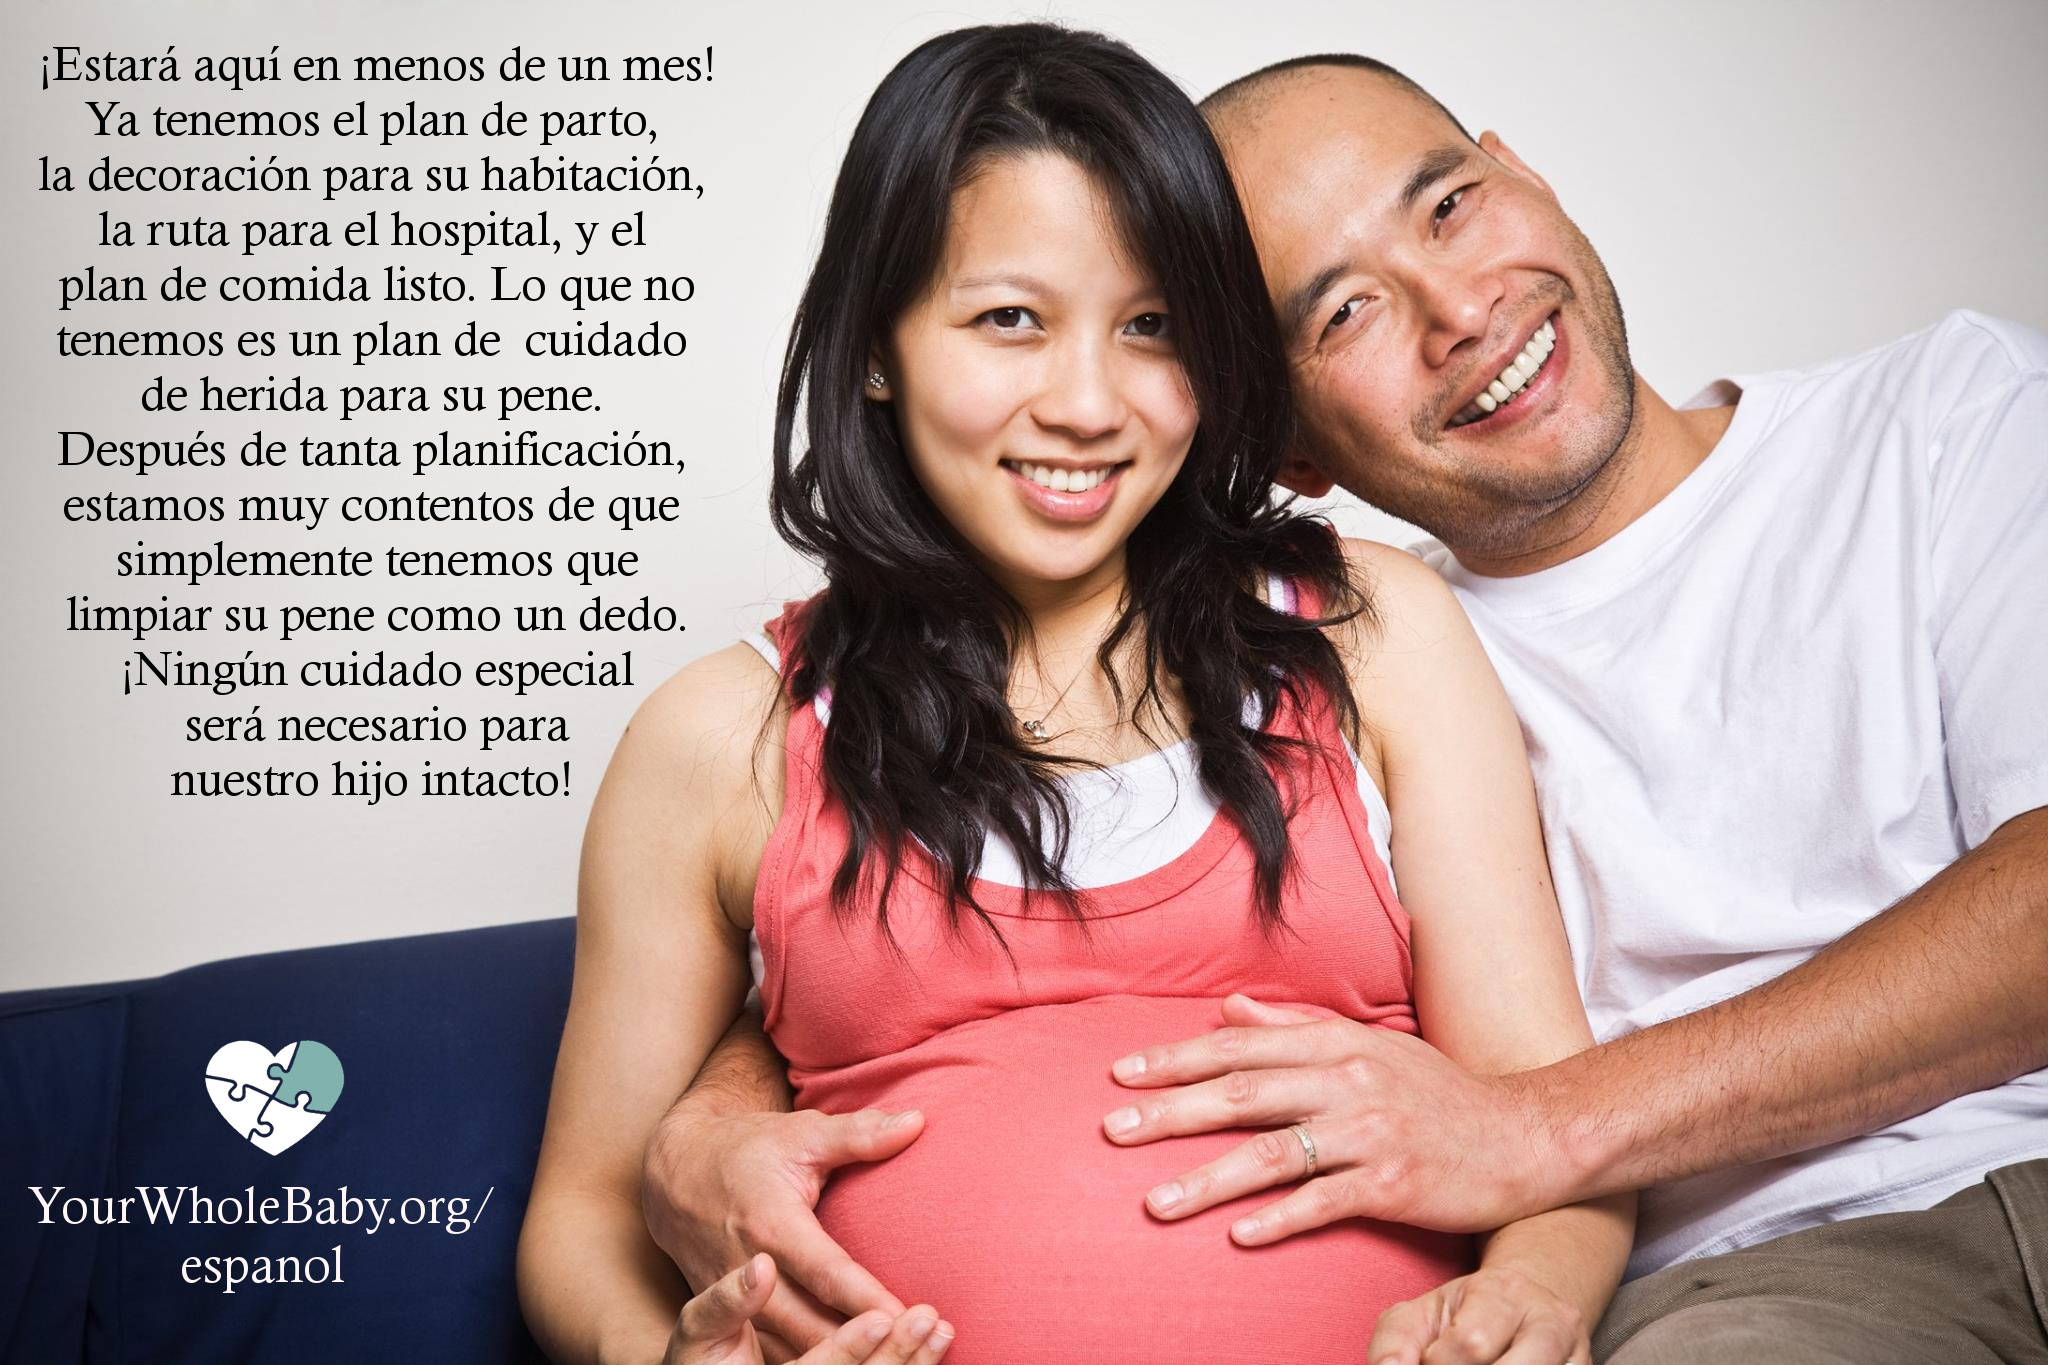 ywb asian couple spanish.jpg